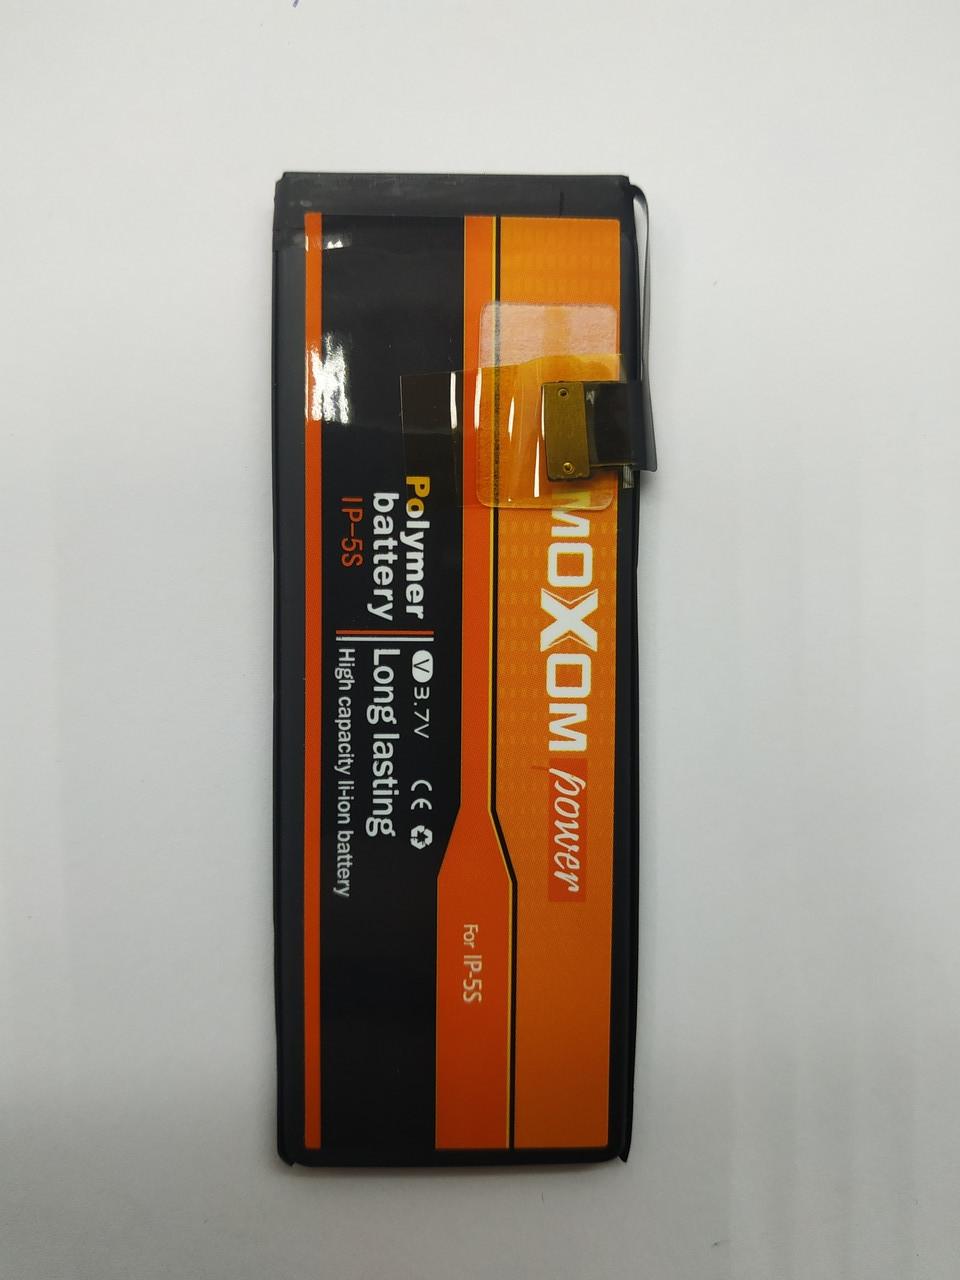 батарея для iphone 5 харьков